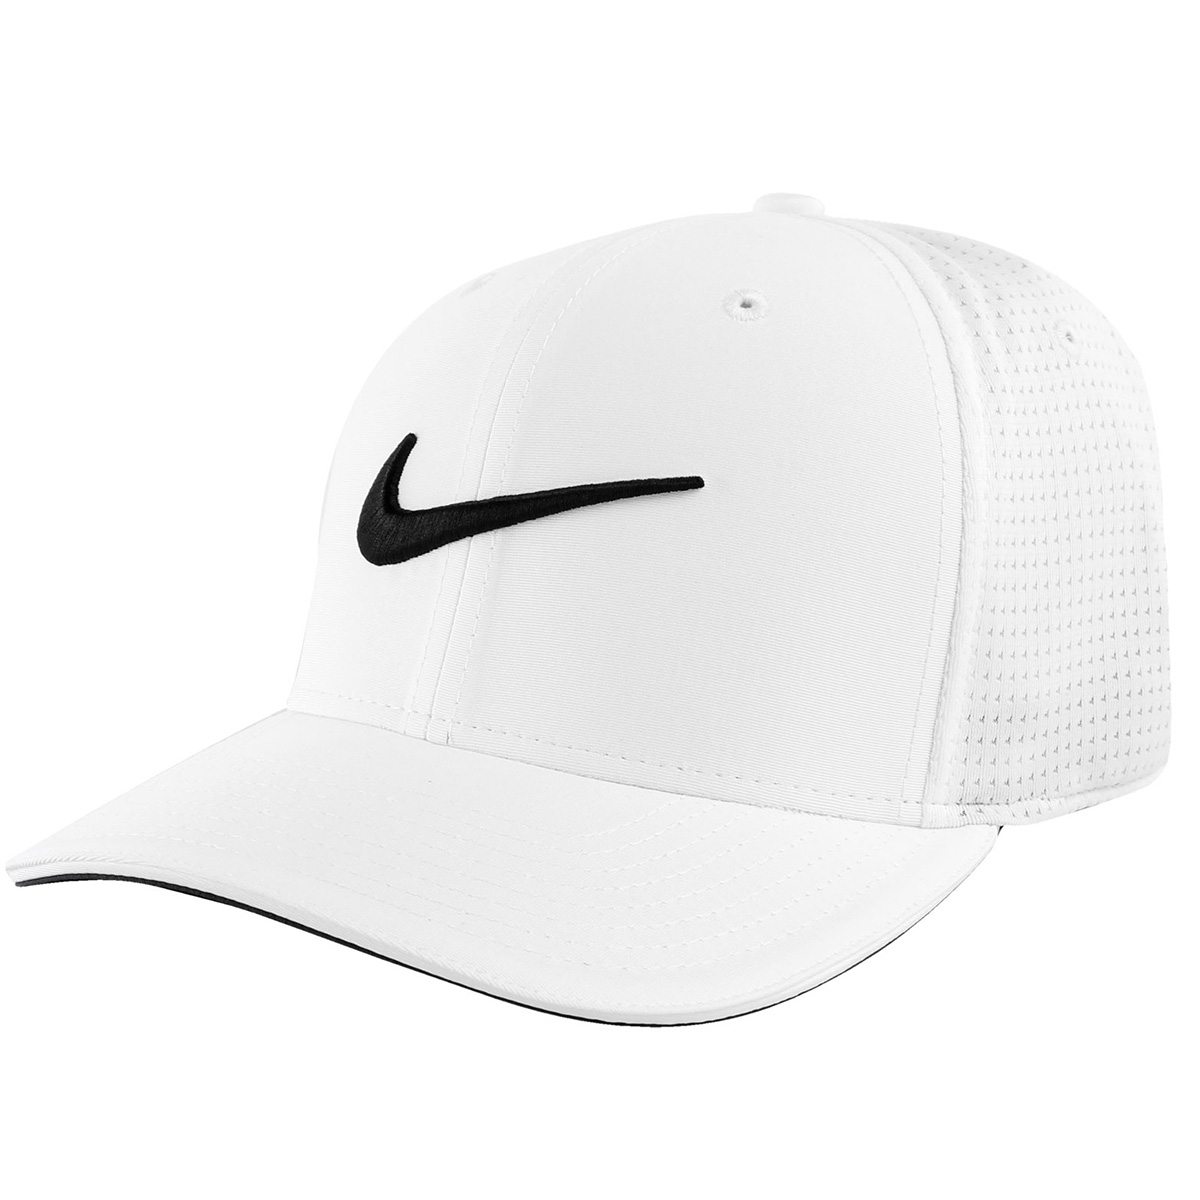 943f0104d2a Nike Golf Classic 99 Mesh Cap from american golf